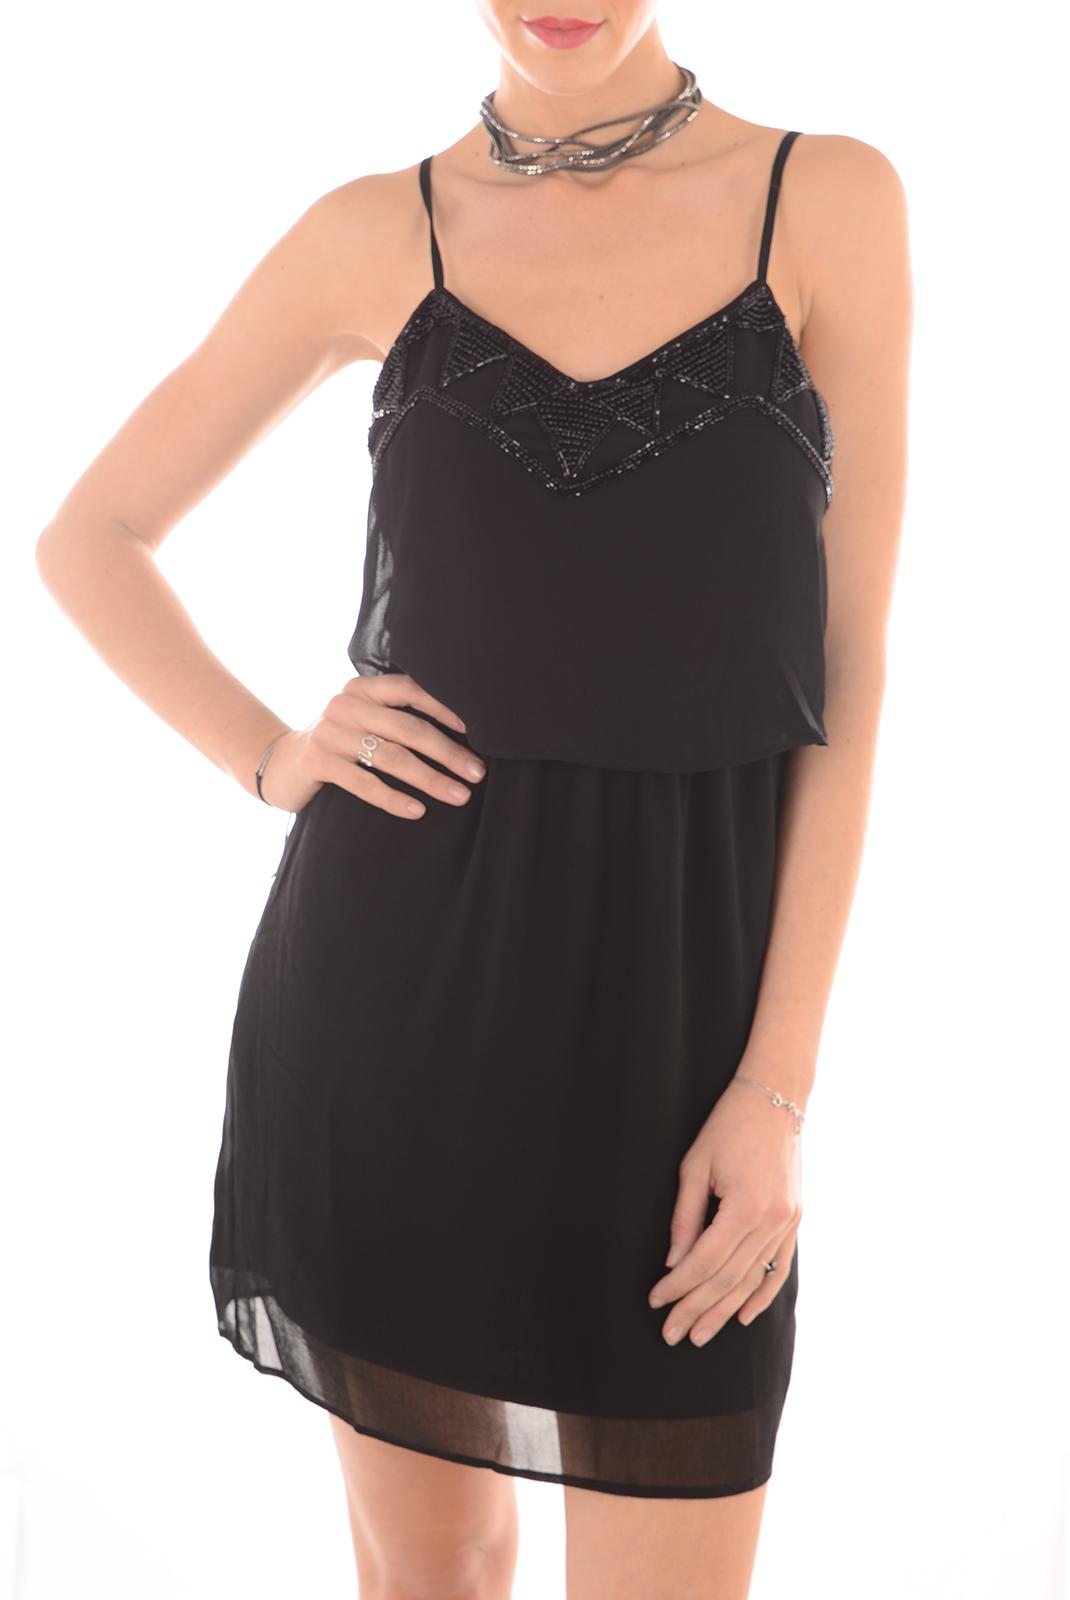 FEMME  Vero moda SOPHIE SL MINI DRESS BLACK